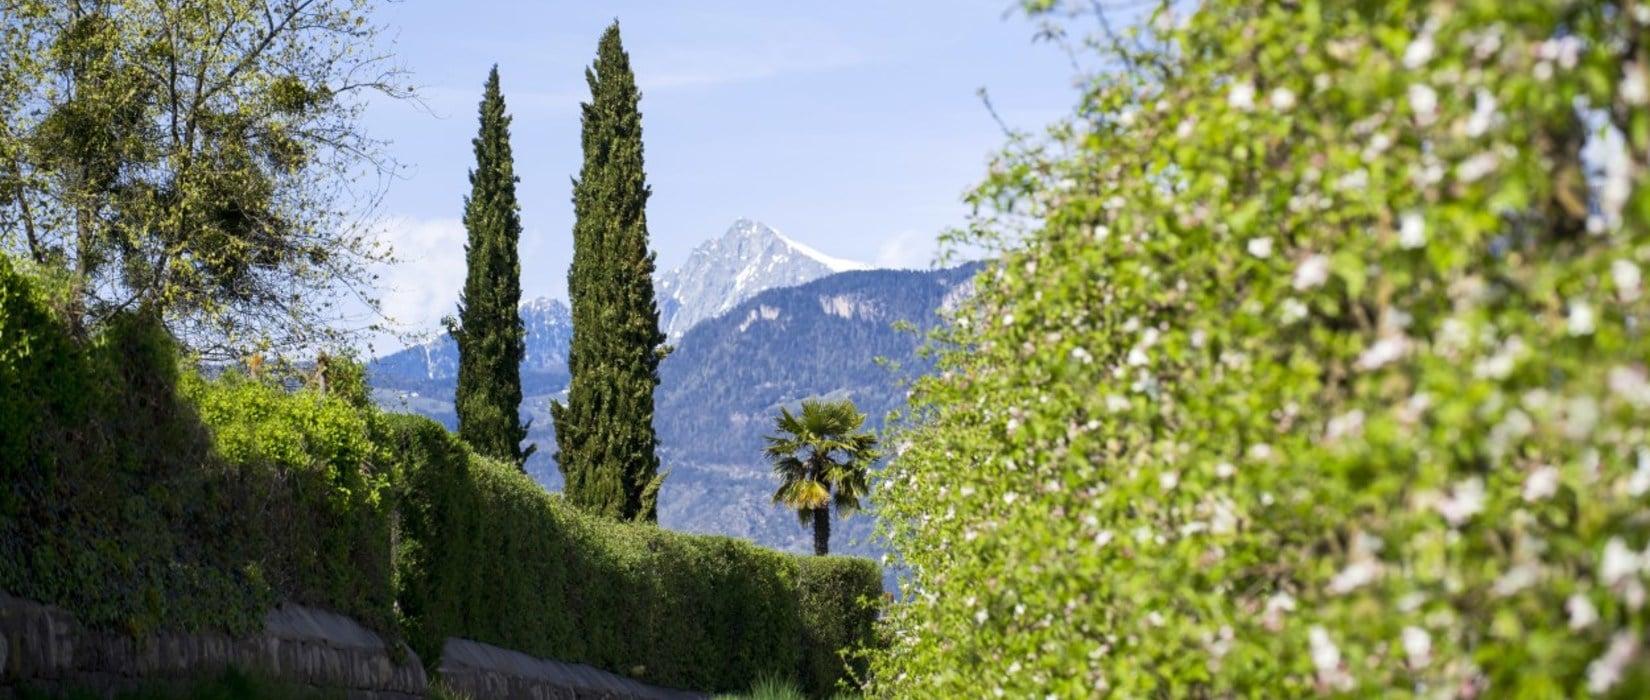 Frühlingserwachen in Südtirol